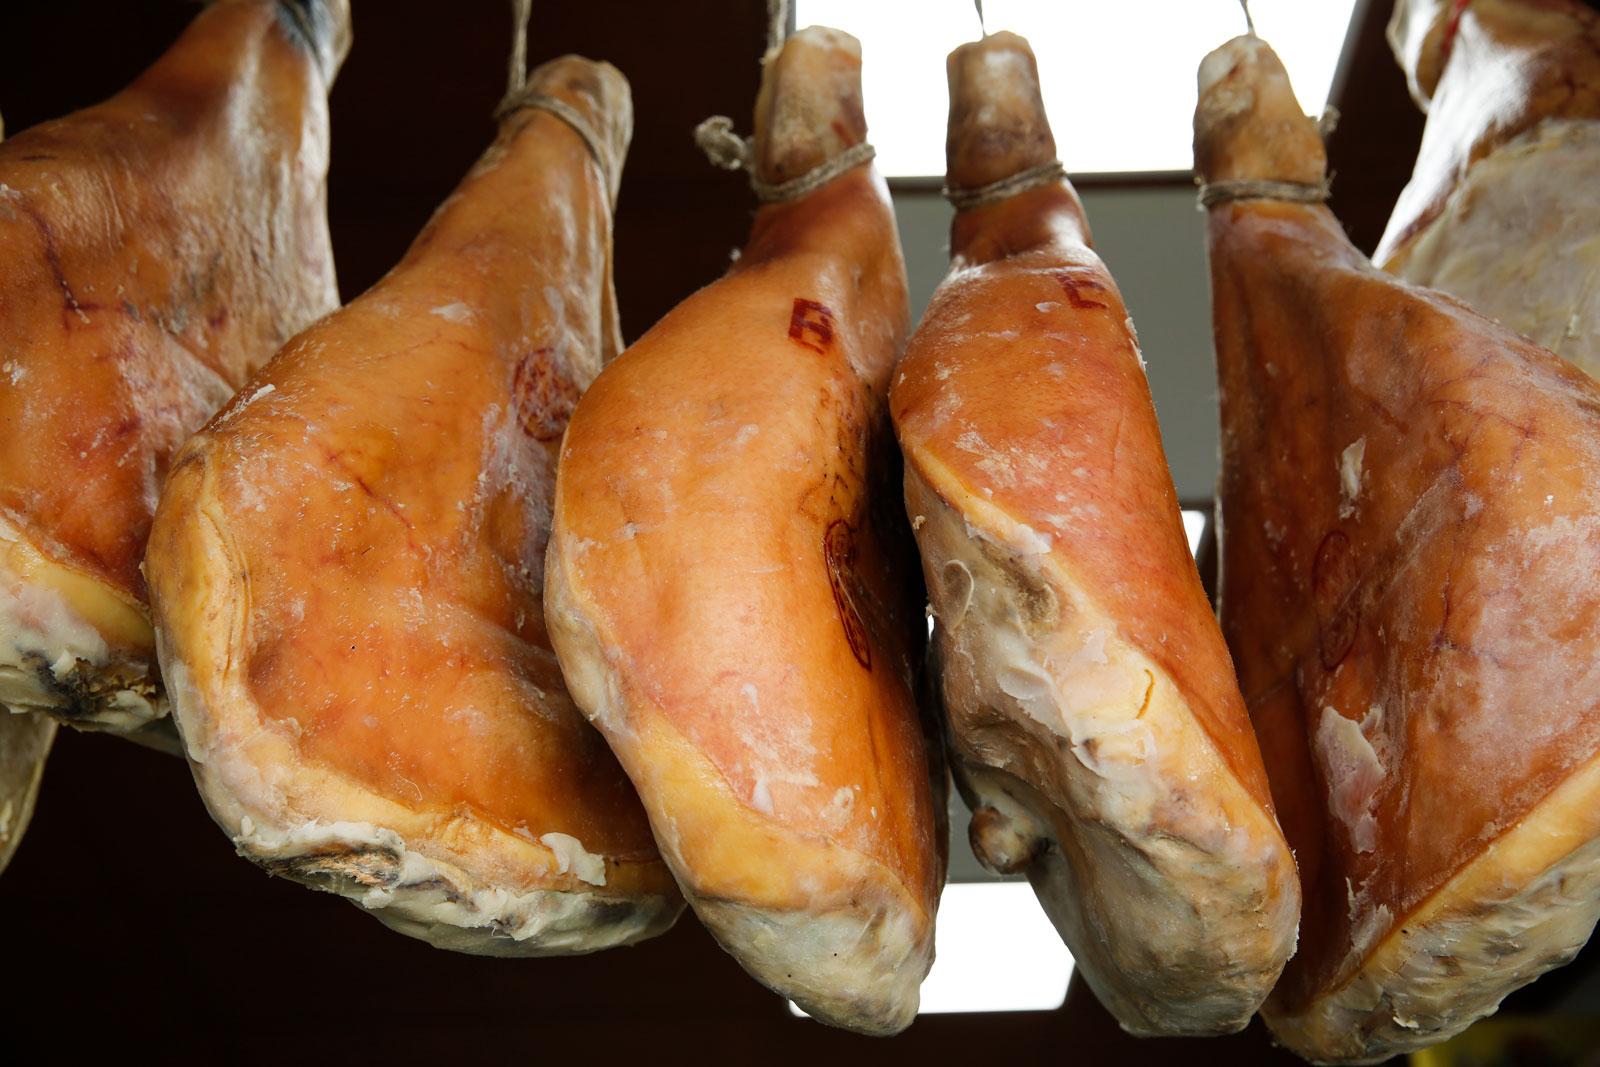 Lufttorkad skinka hänger i taken lite varstans i Italien.